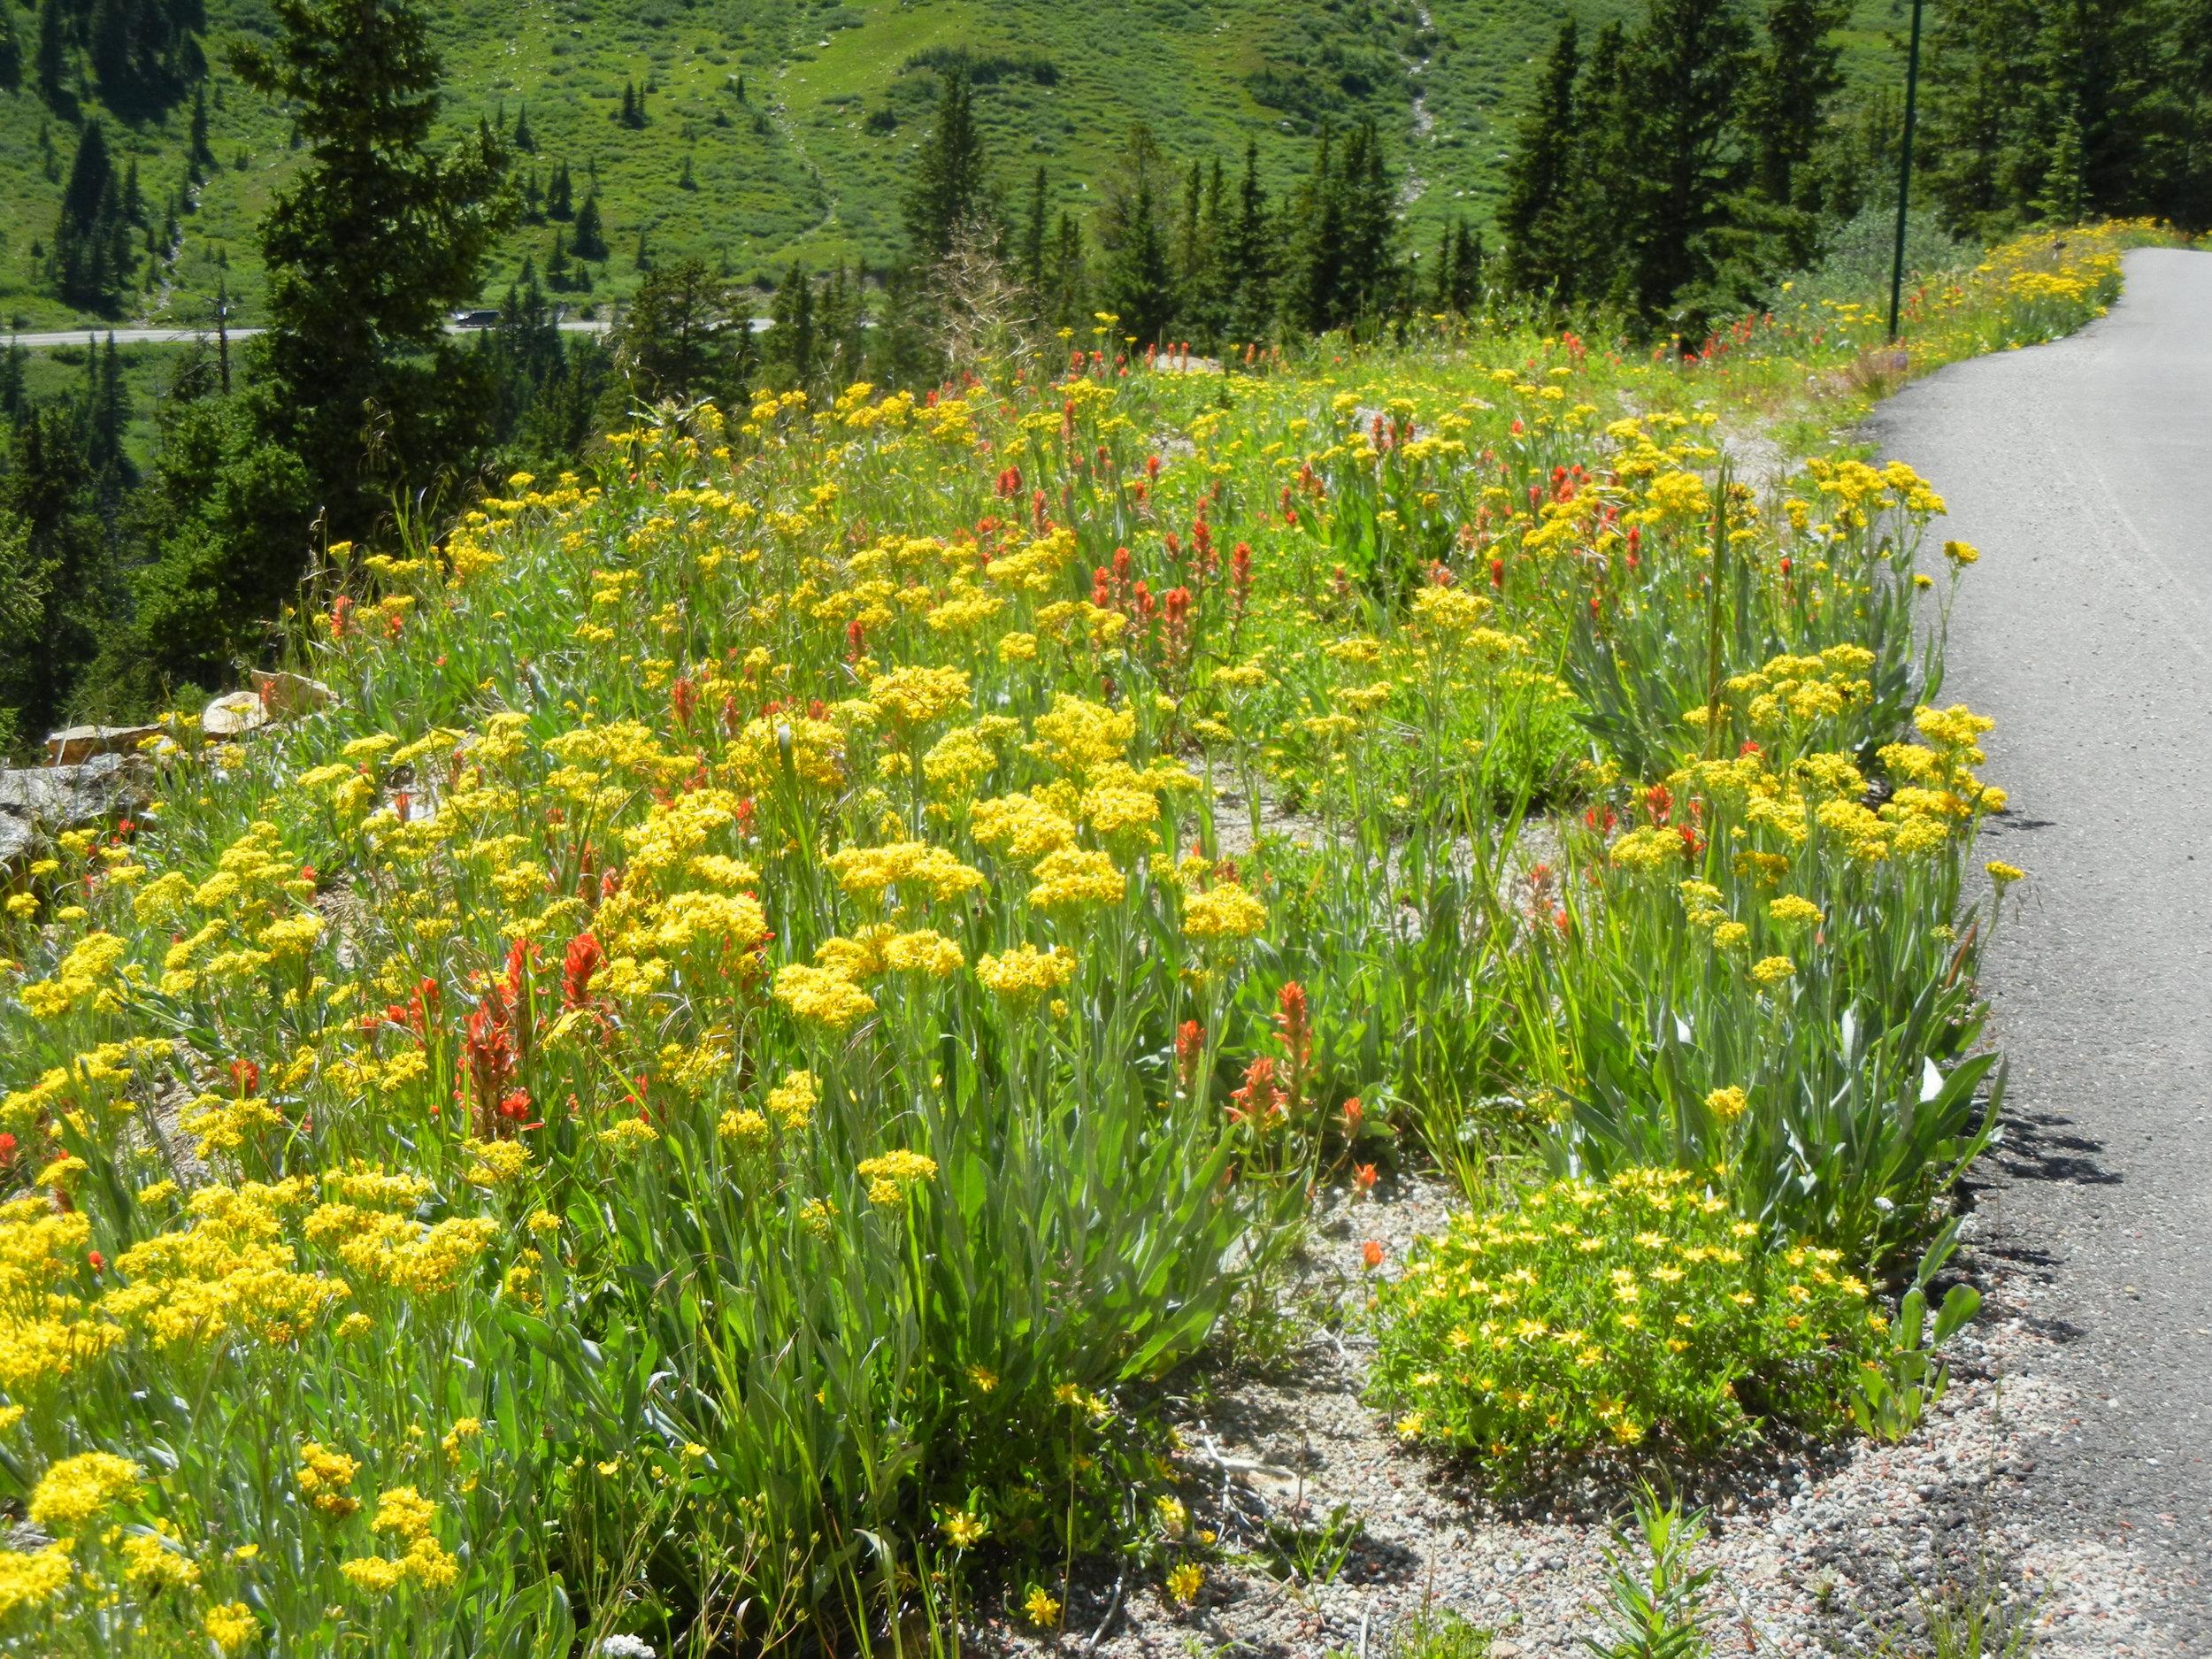 Native roadside wildflowers